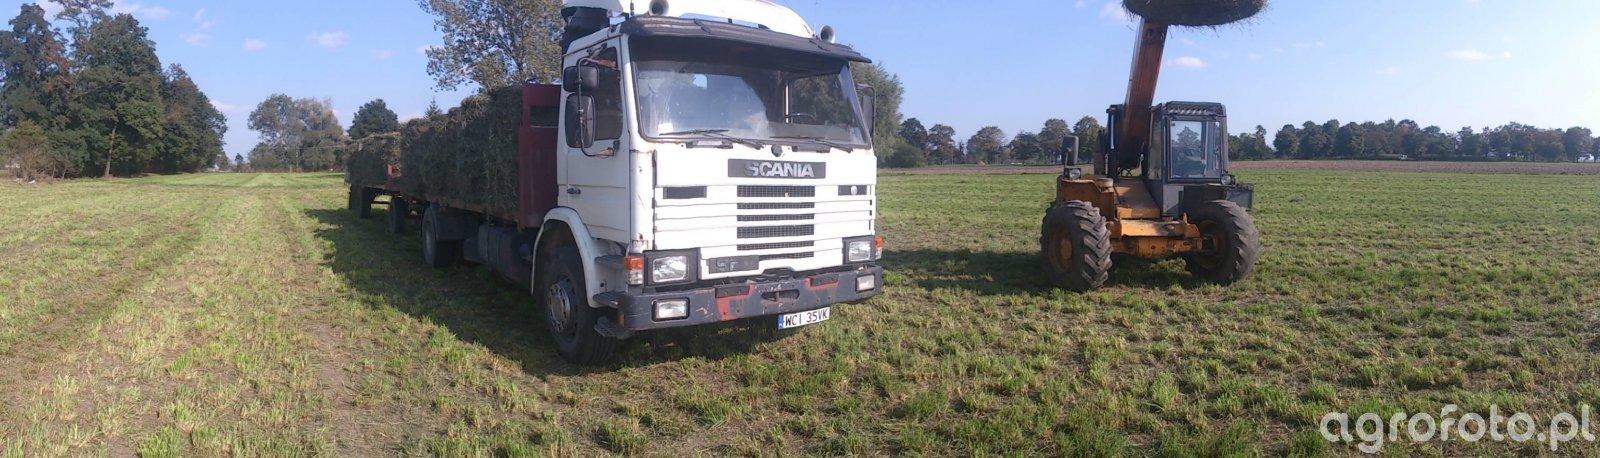 JCB i Scania